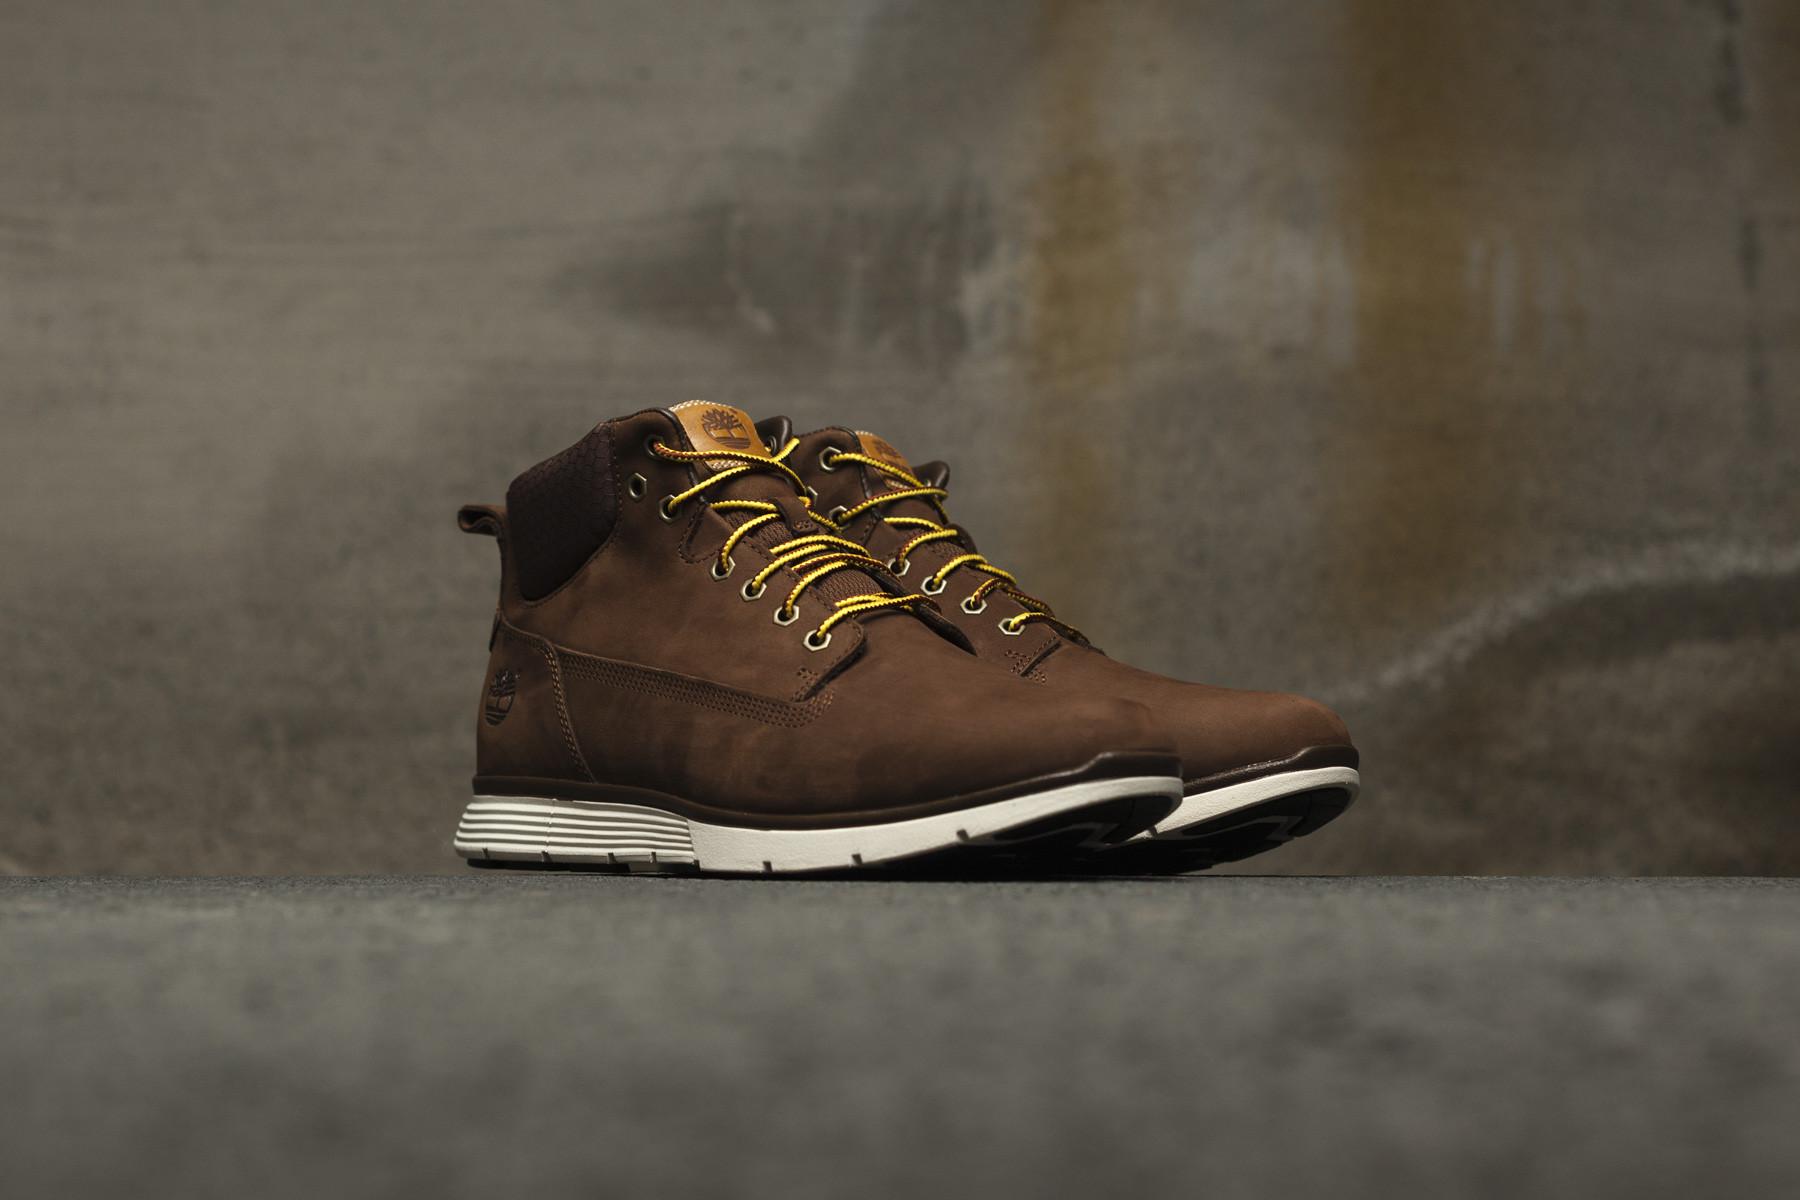 Timberland Killington Chukka Potting Soil Boots Sneaker No